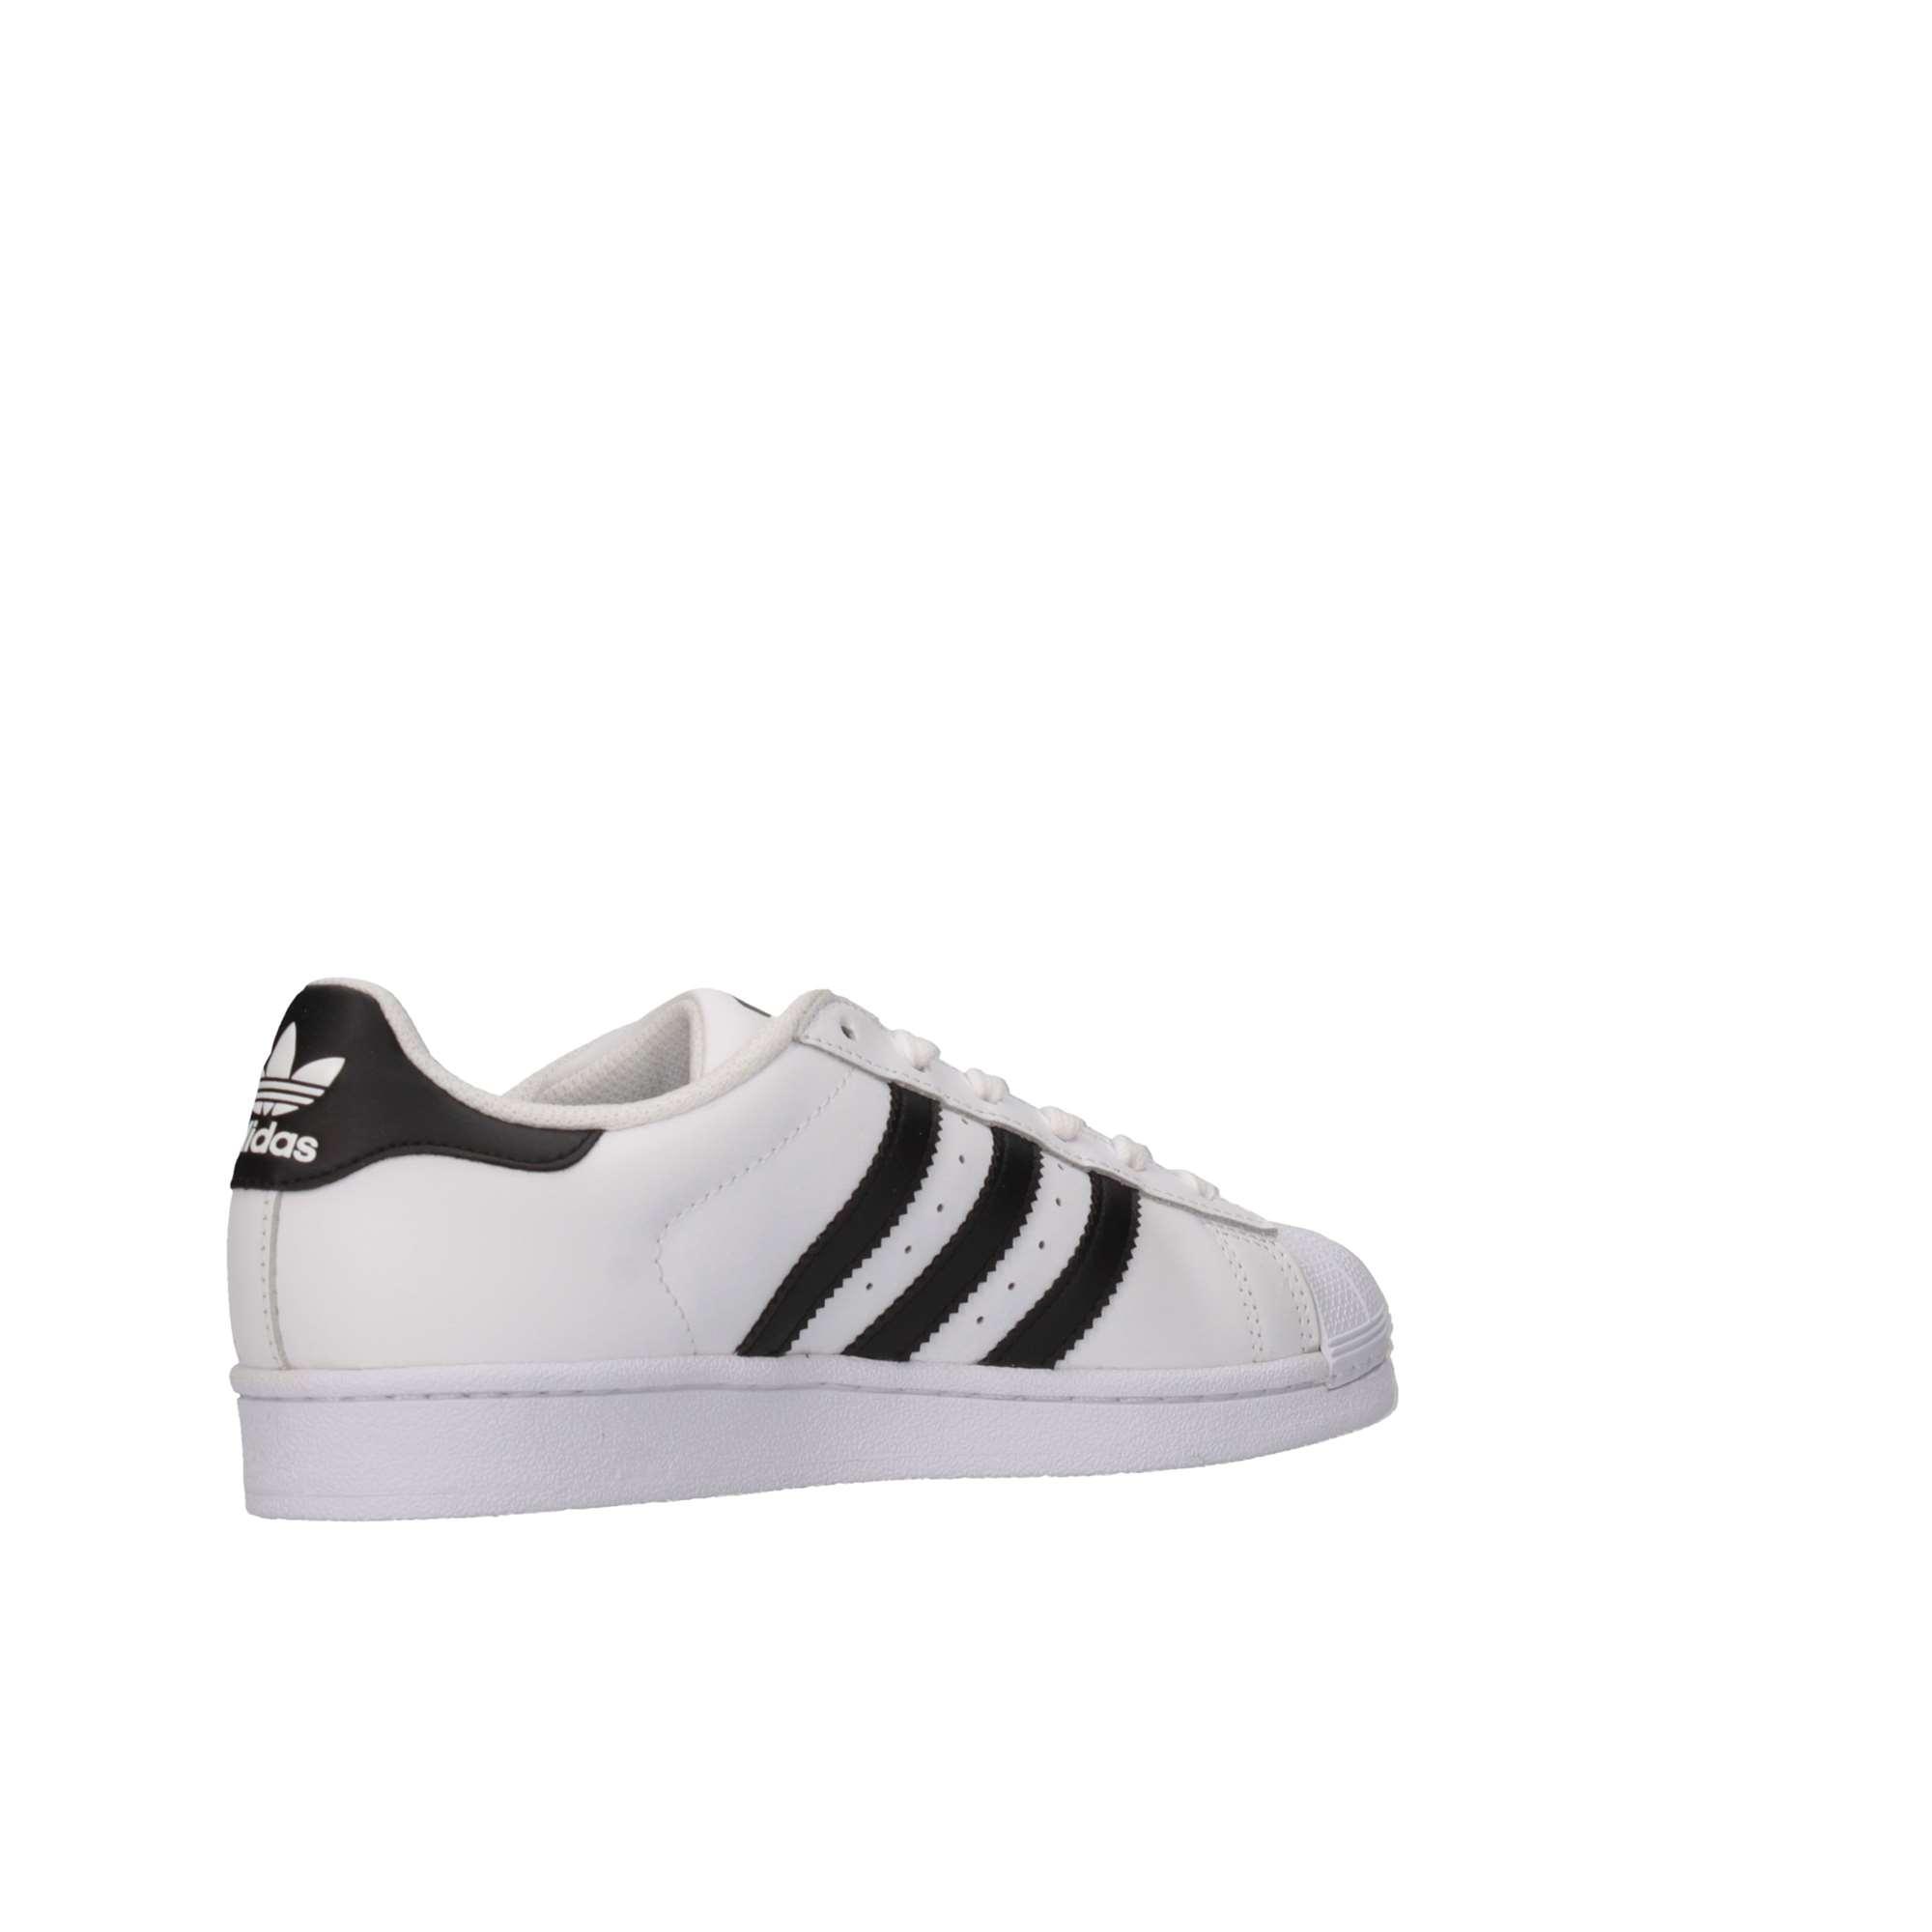 Sneakers-Bambino-Adidas-SUPERSTAR-J-C77154-Autunno-Inverno